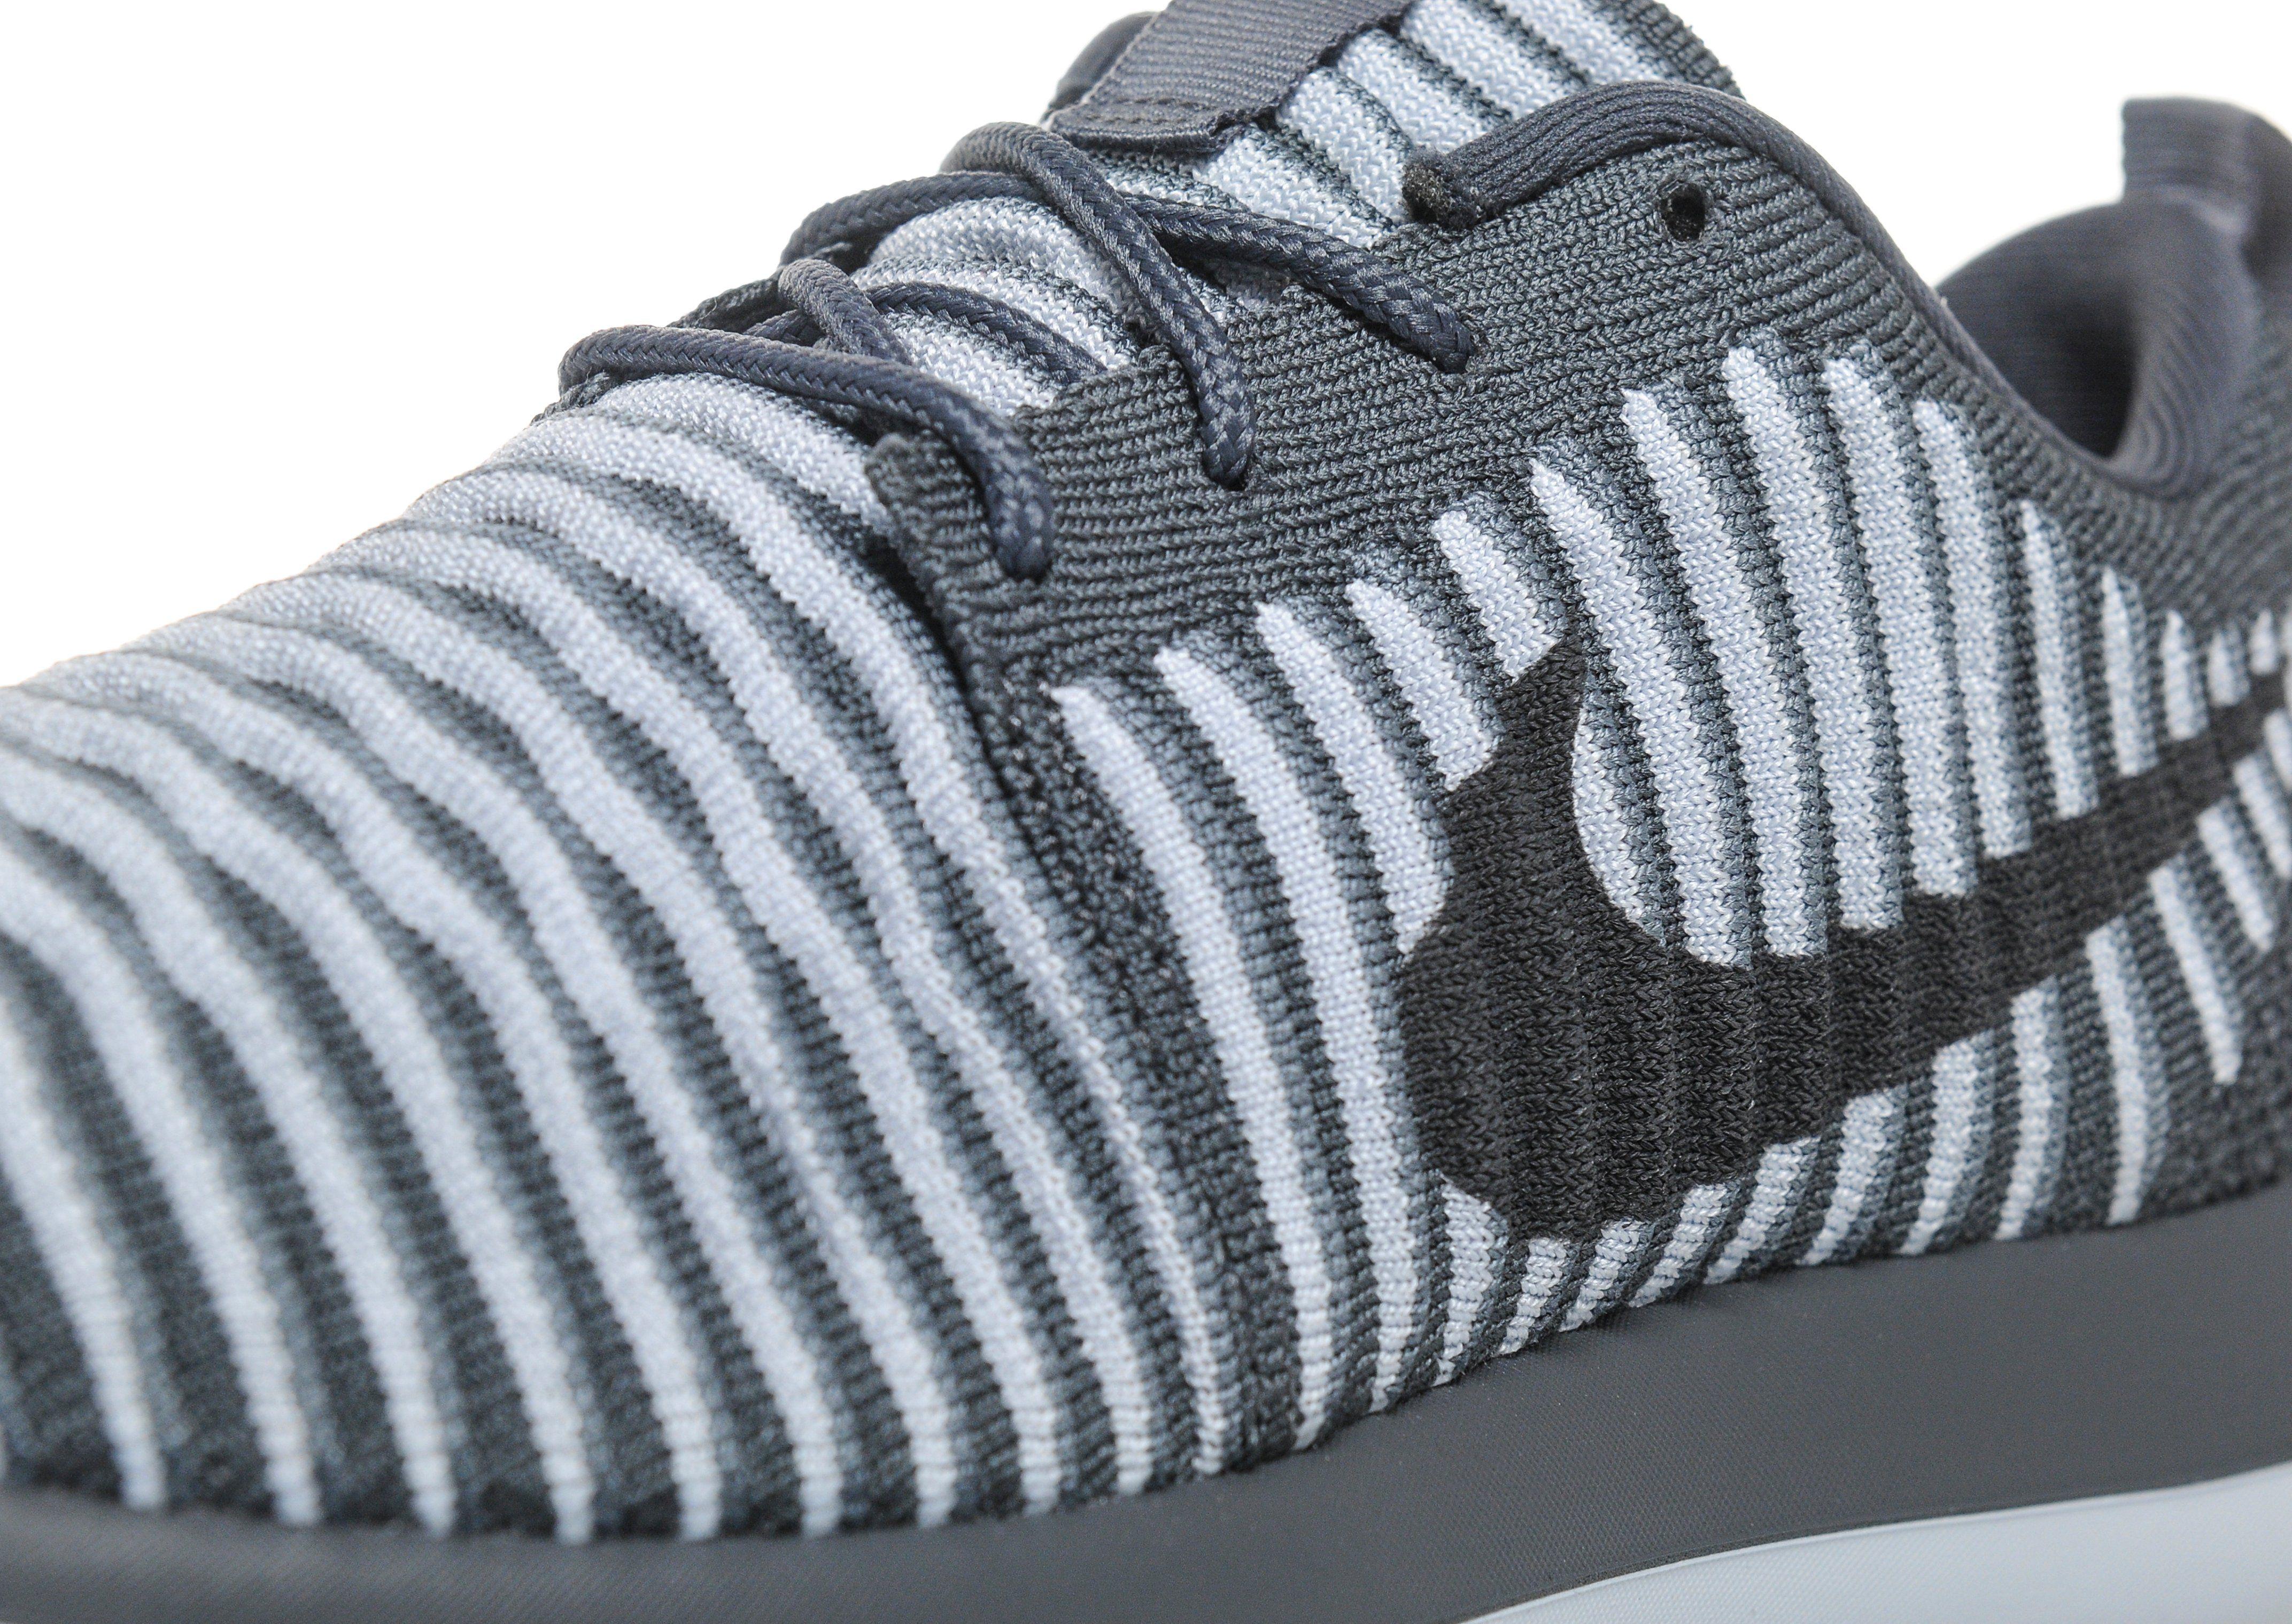 jvakx Nike Roshe 2 Flyknit Women\'s | JD Sports